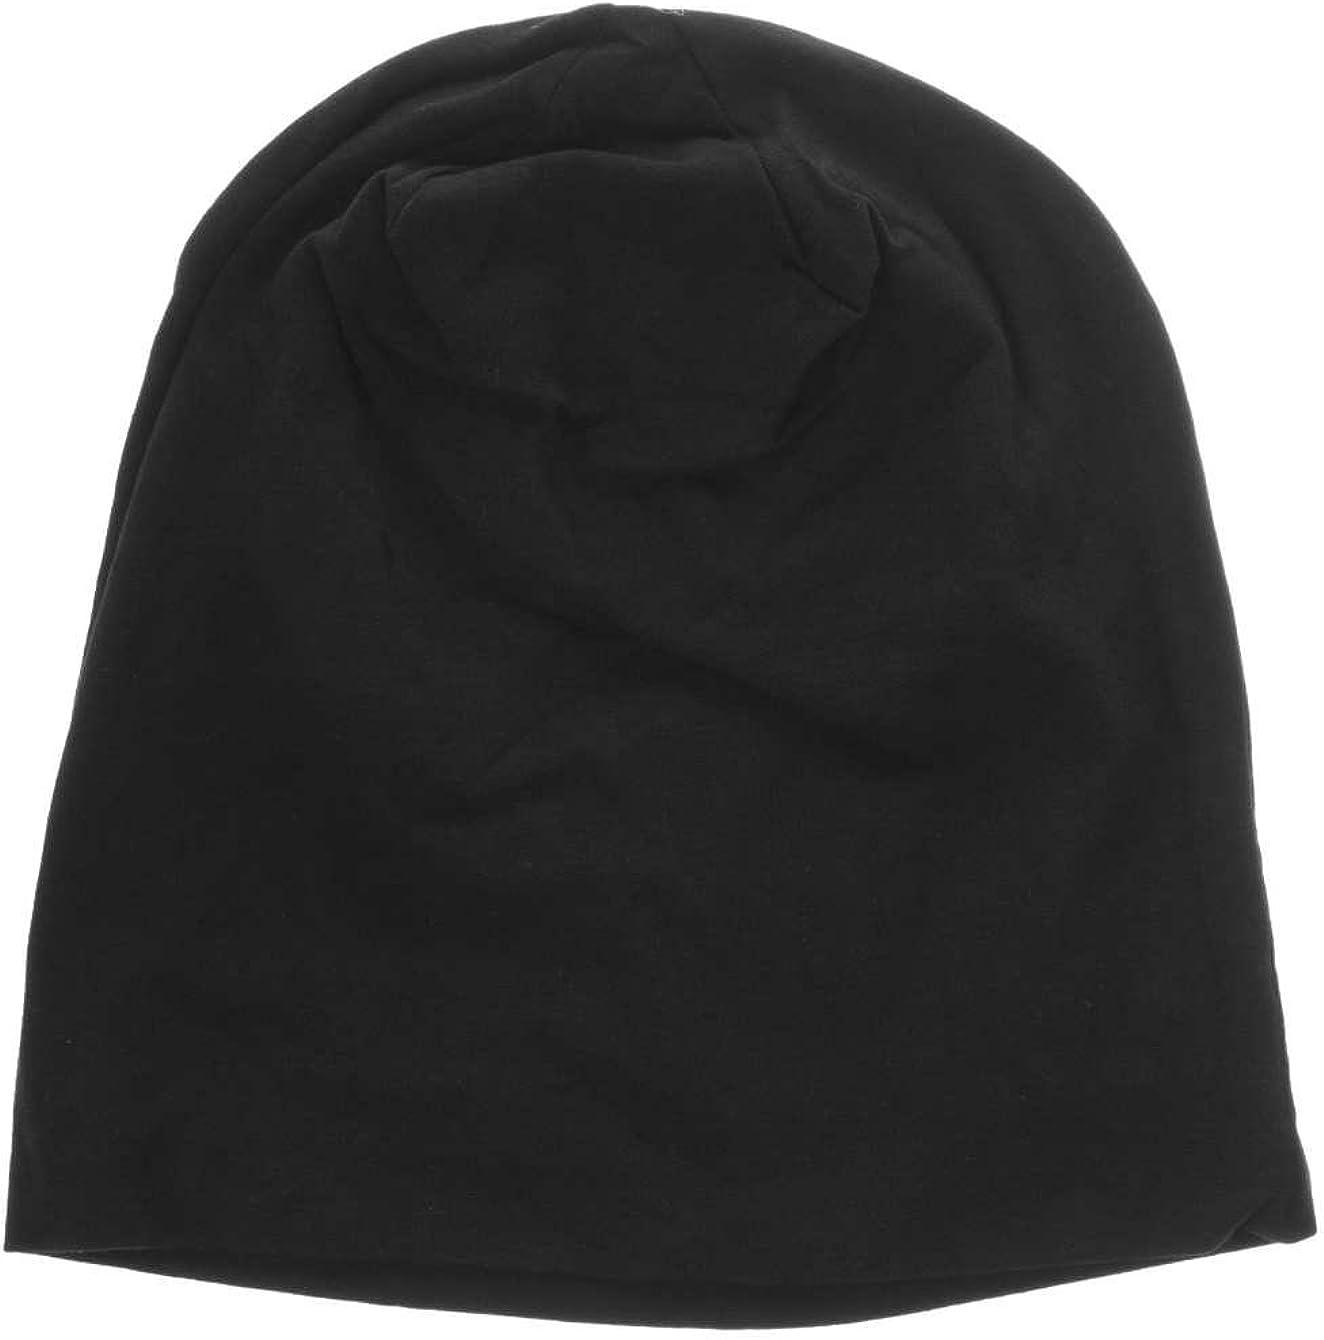 Masterdis Ladies//Men/'s Jersey Beanie Hat Fabric Cotton Autumn//Winter